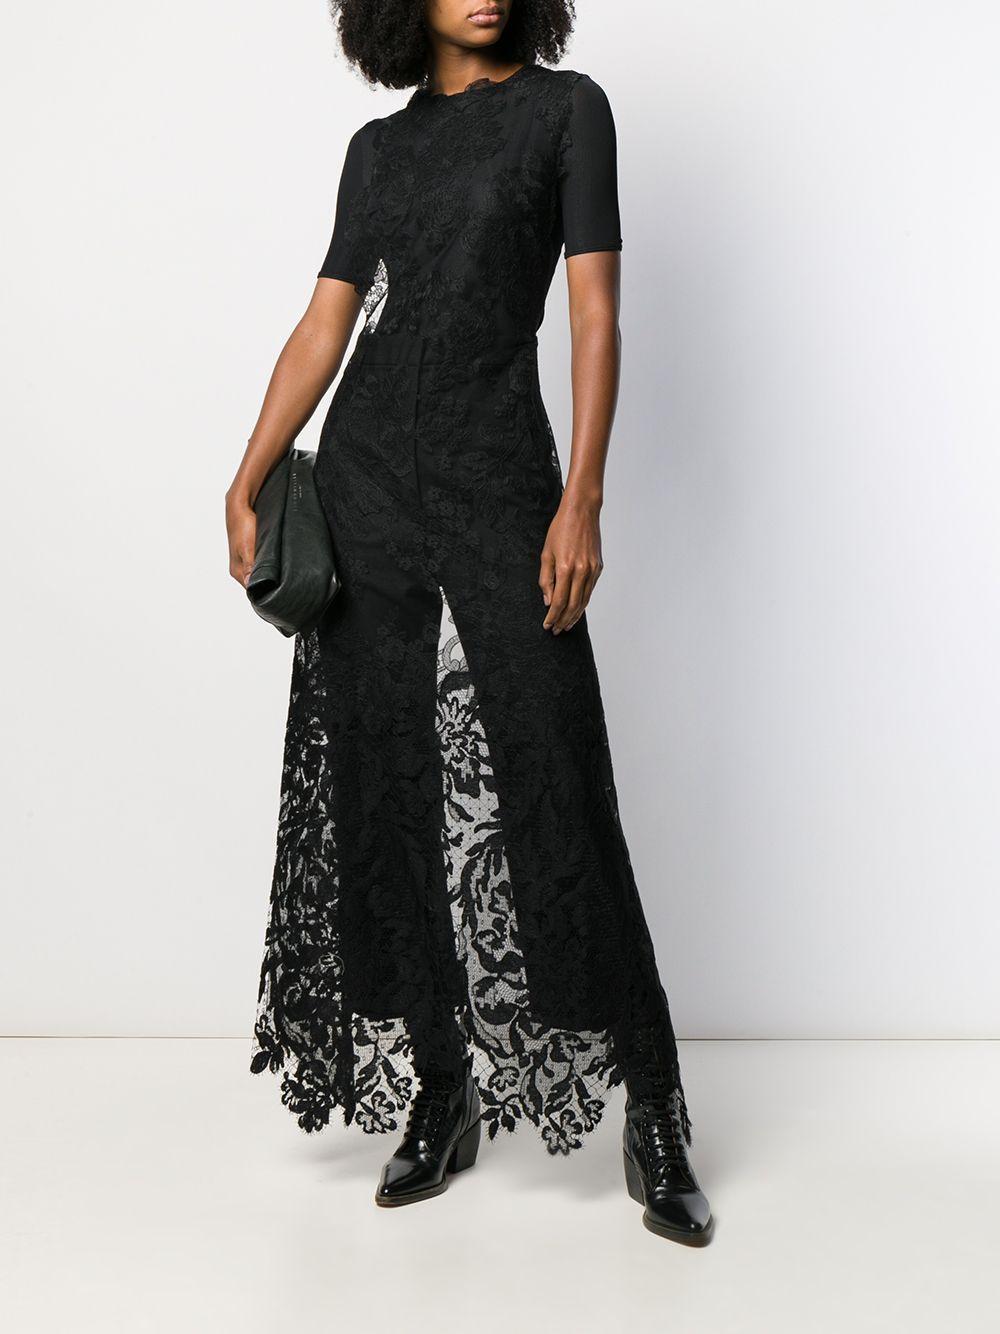 Blusa larga de encaje Vera Wang de Encaje de color Negro